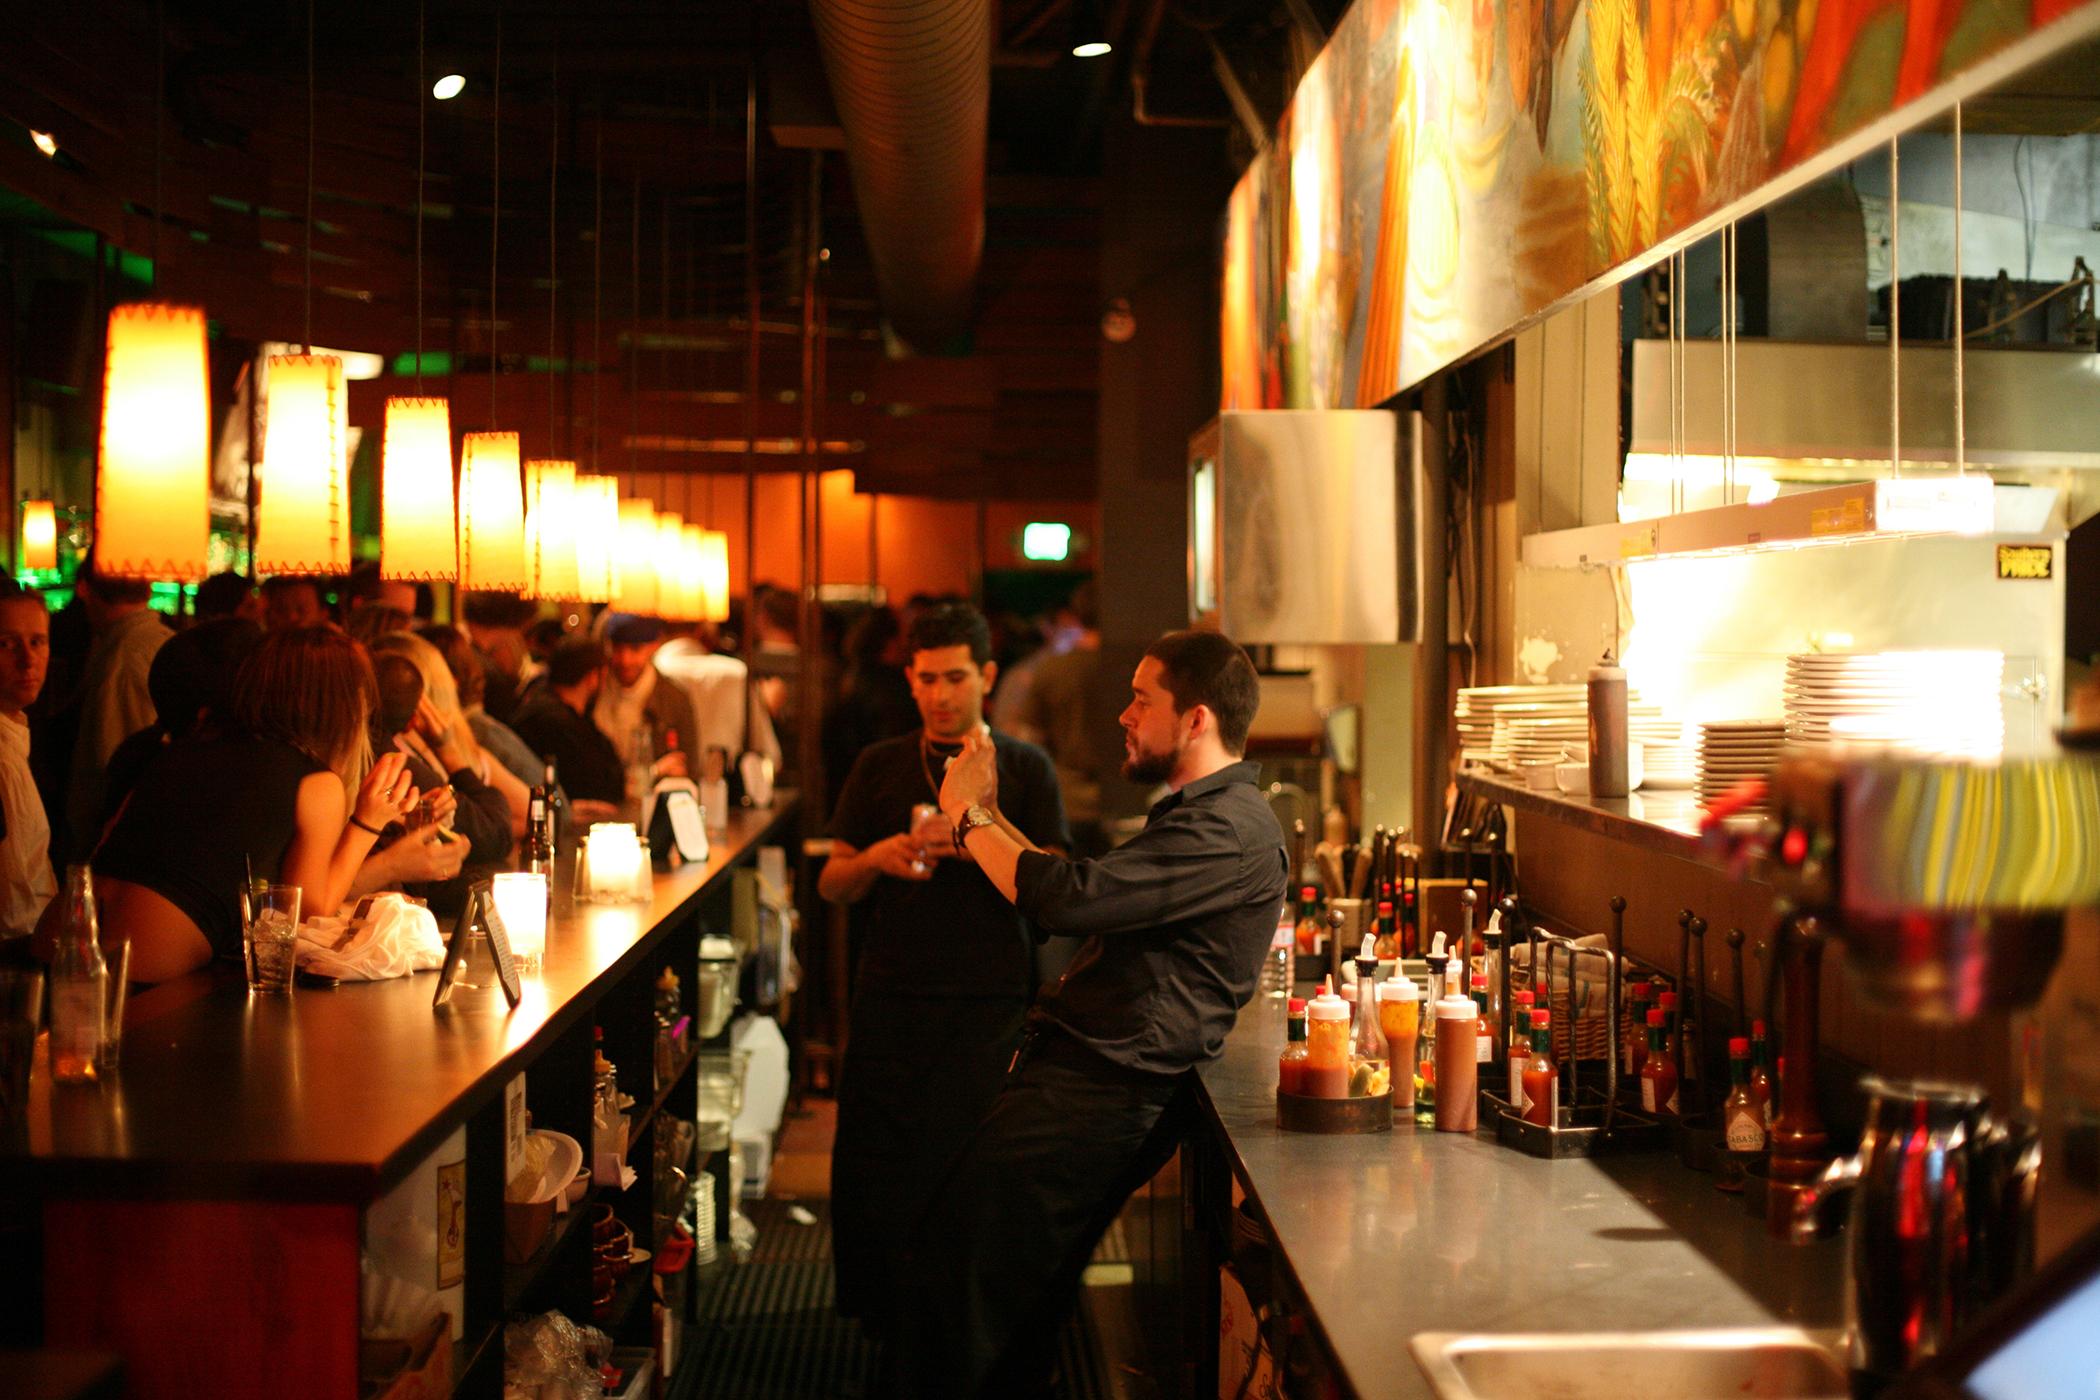 Bartender taking photograph of patrons in bar at Belltown, Seattle, Washington